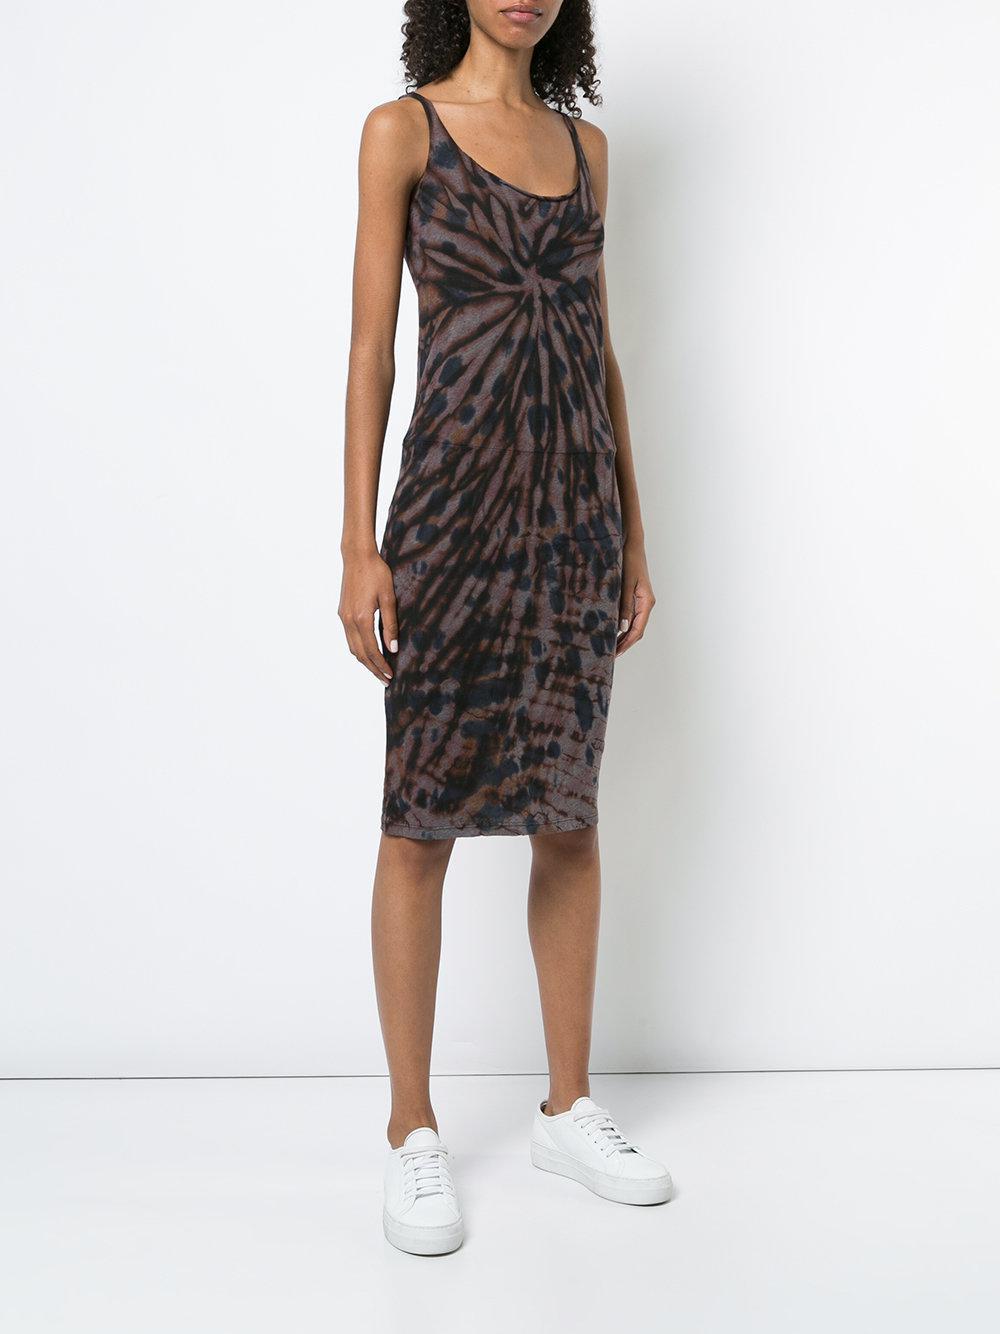 4882ec54989e raquel-allegra-Brown-Fitted-Silhouette-Day-Dress.jpeg